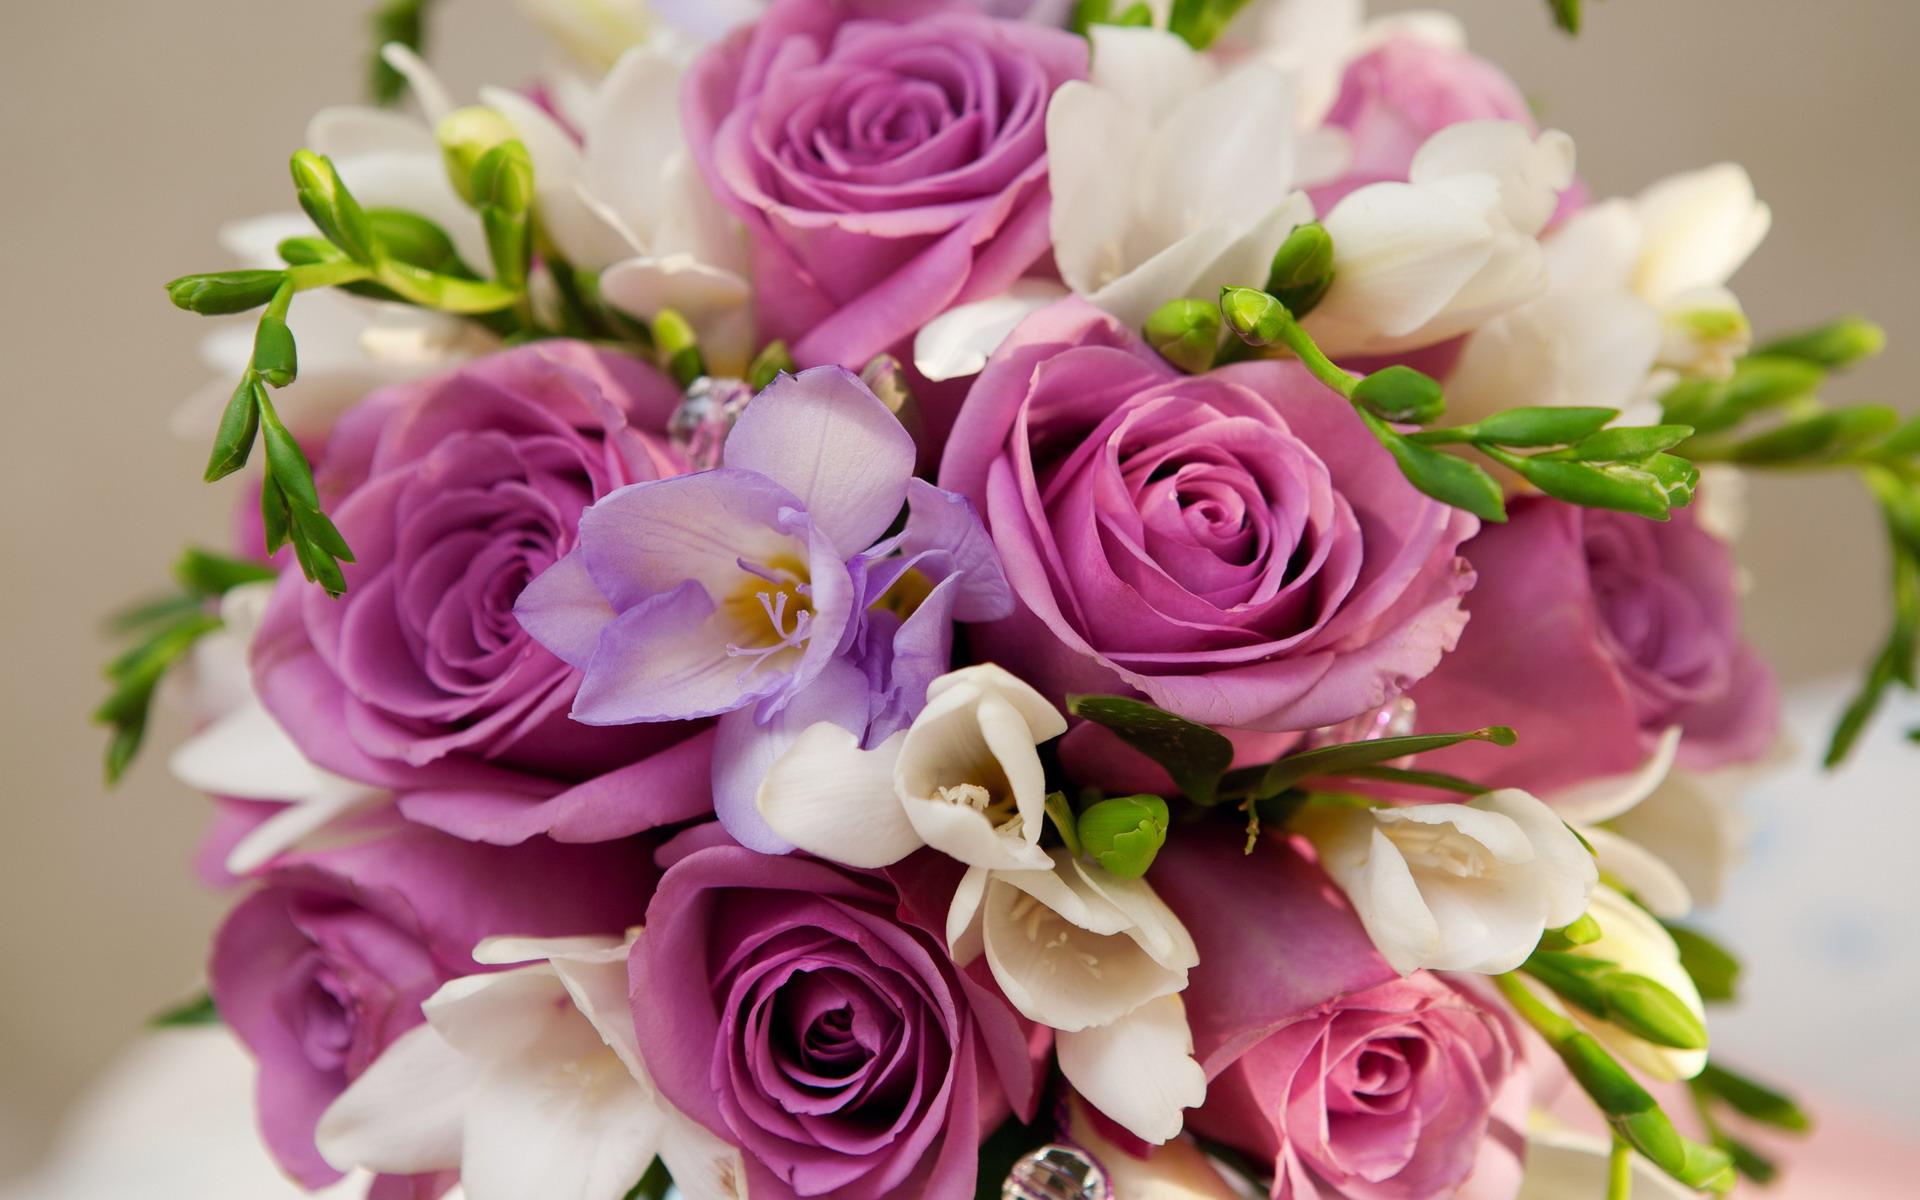 بالصور صور اجمل ورد , اجمل صور لبوكيهات الورد 3493 8